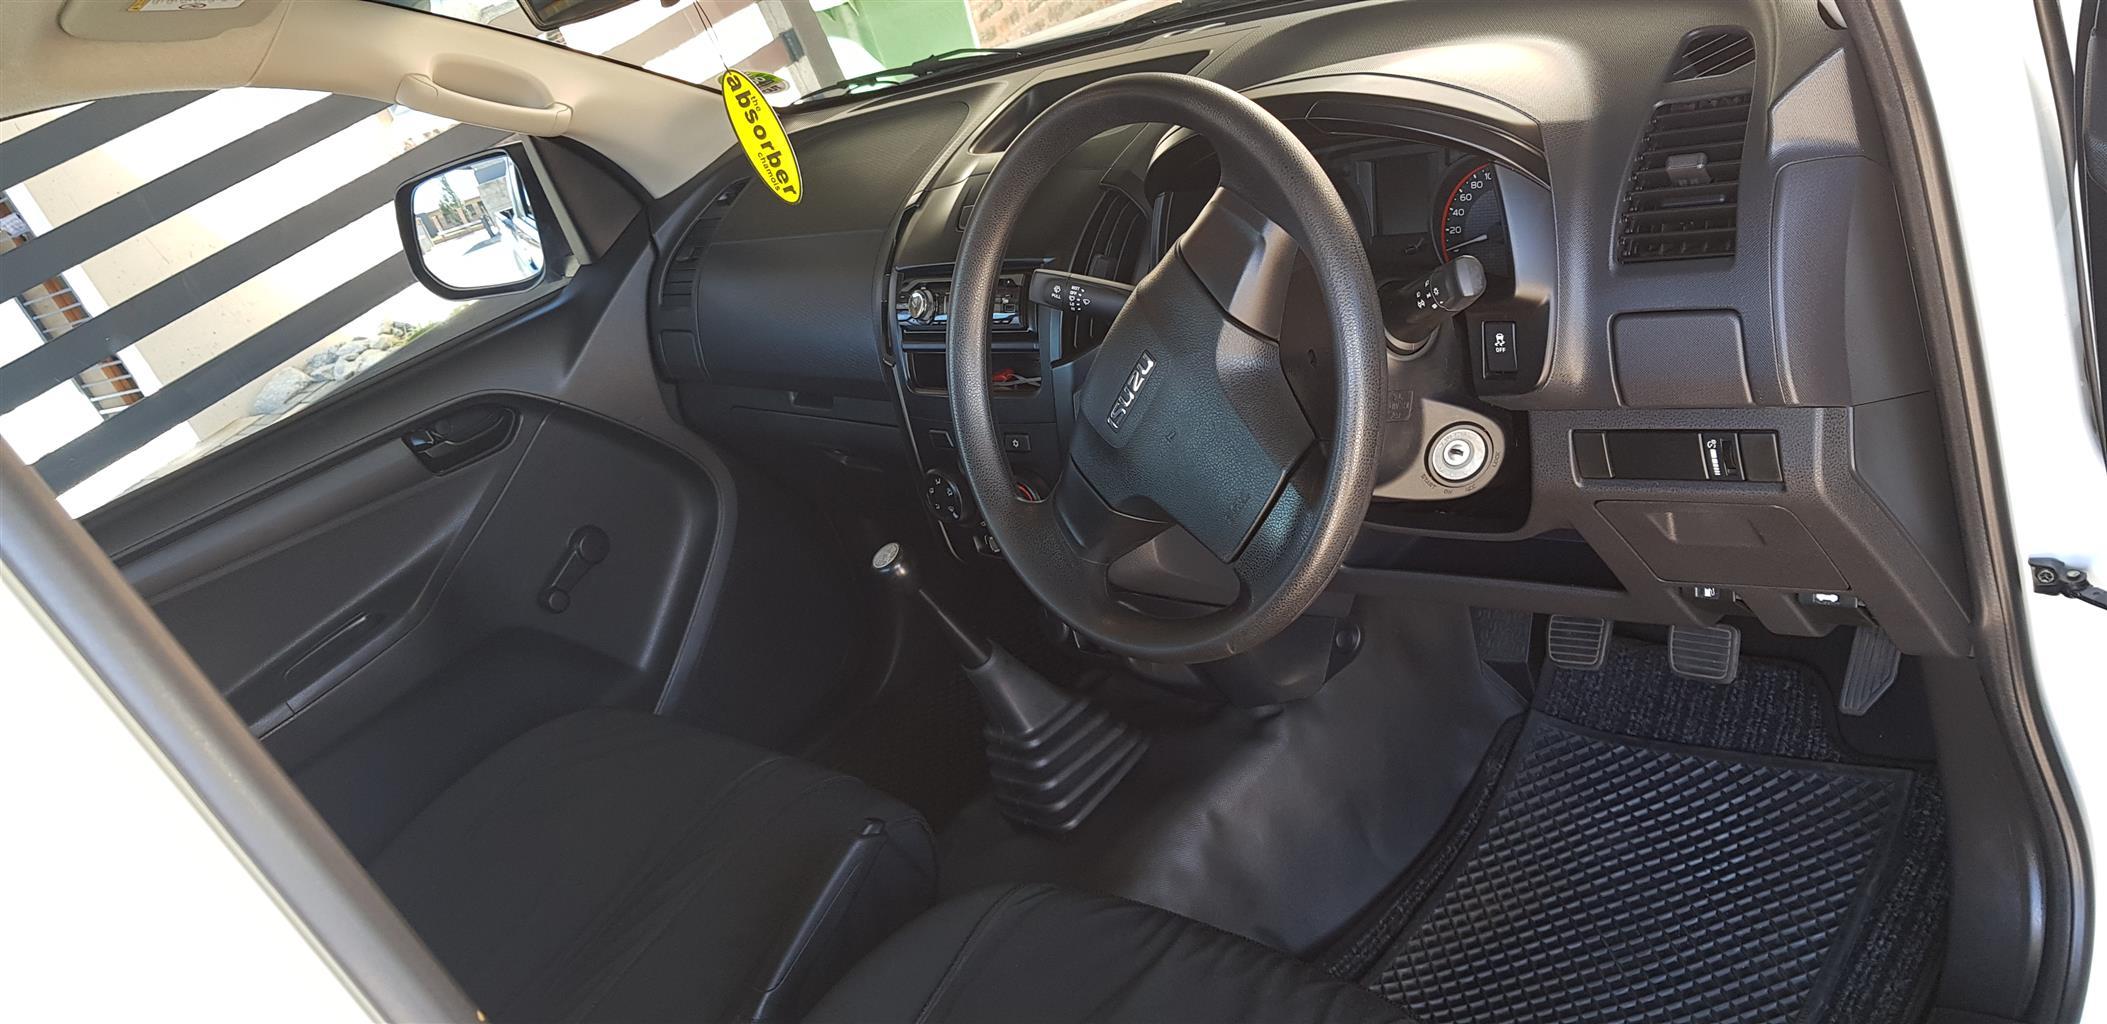 Isuzu KB single cab